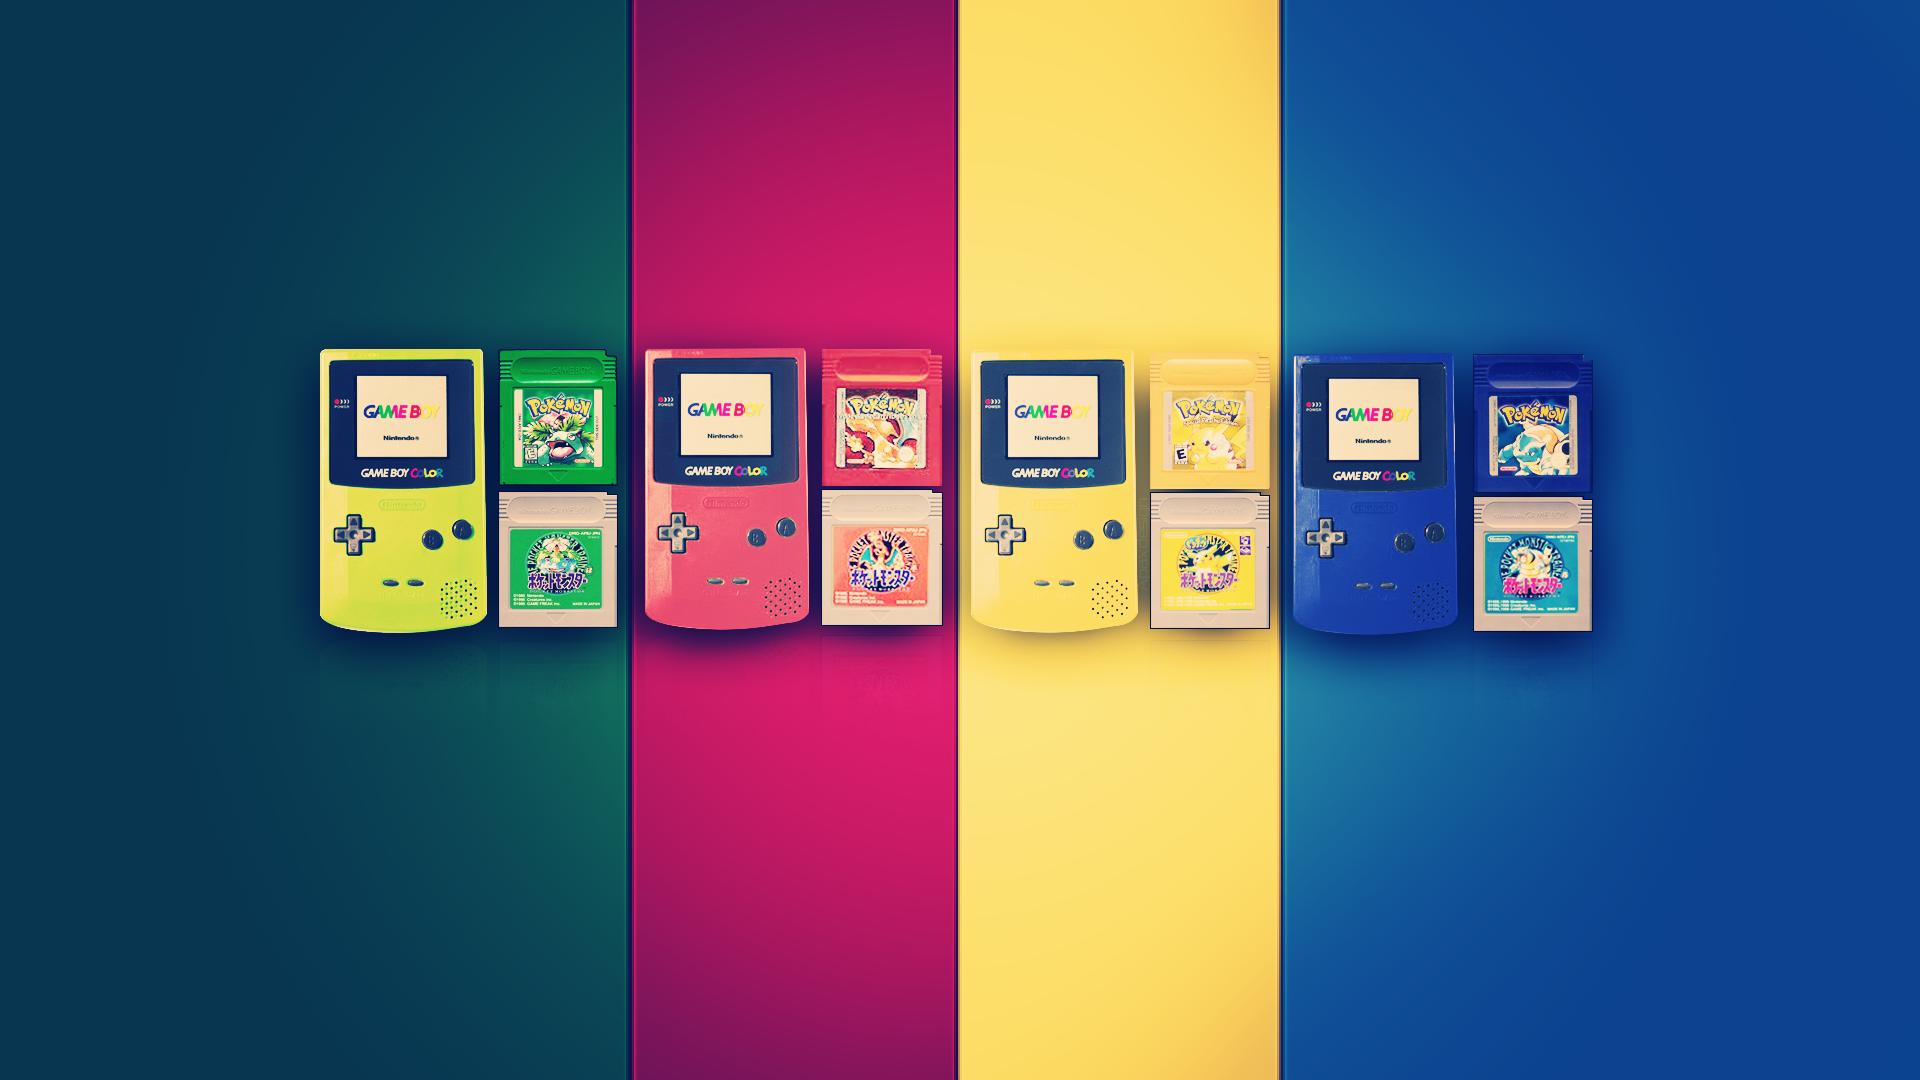 game boy color giochi : Fonds D Cran Game Boy Tous Les Wallpapers Game Boy